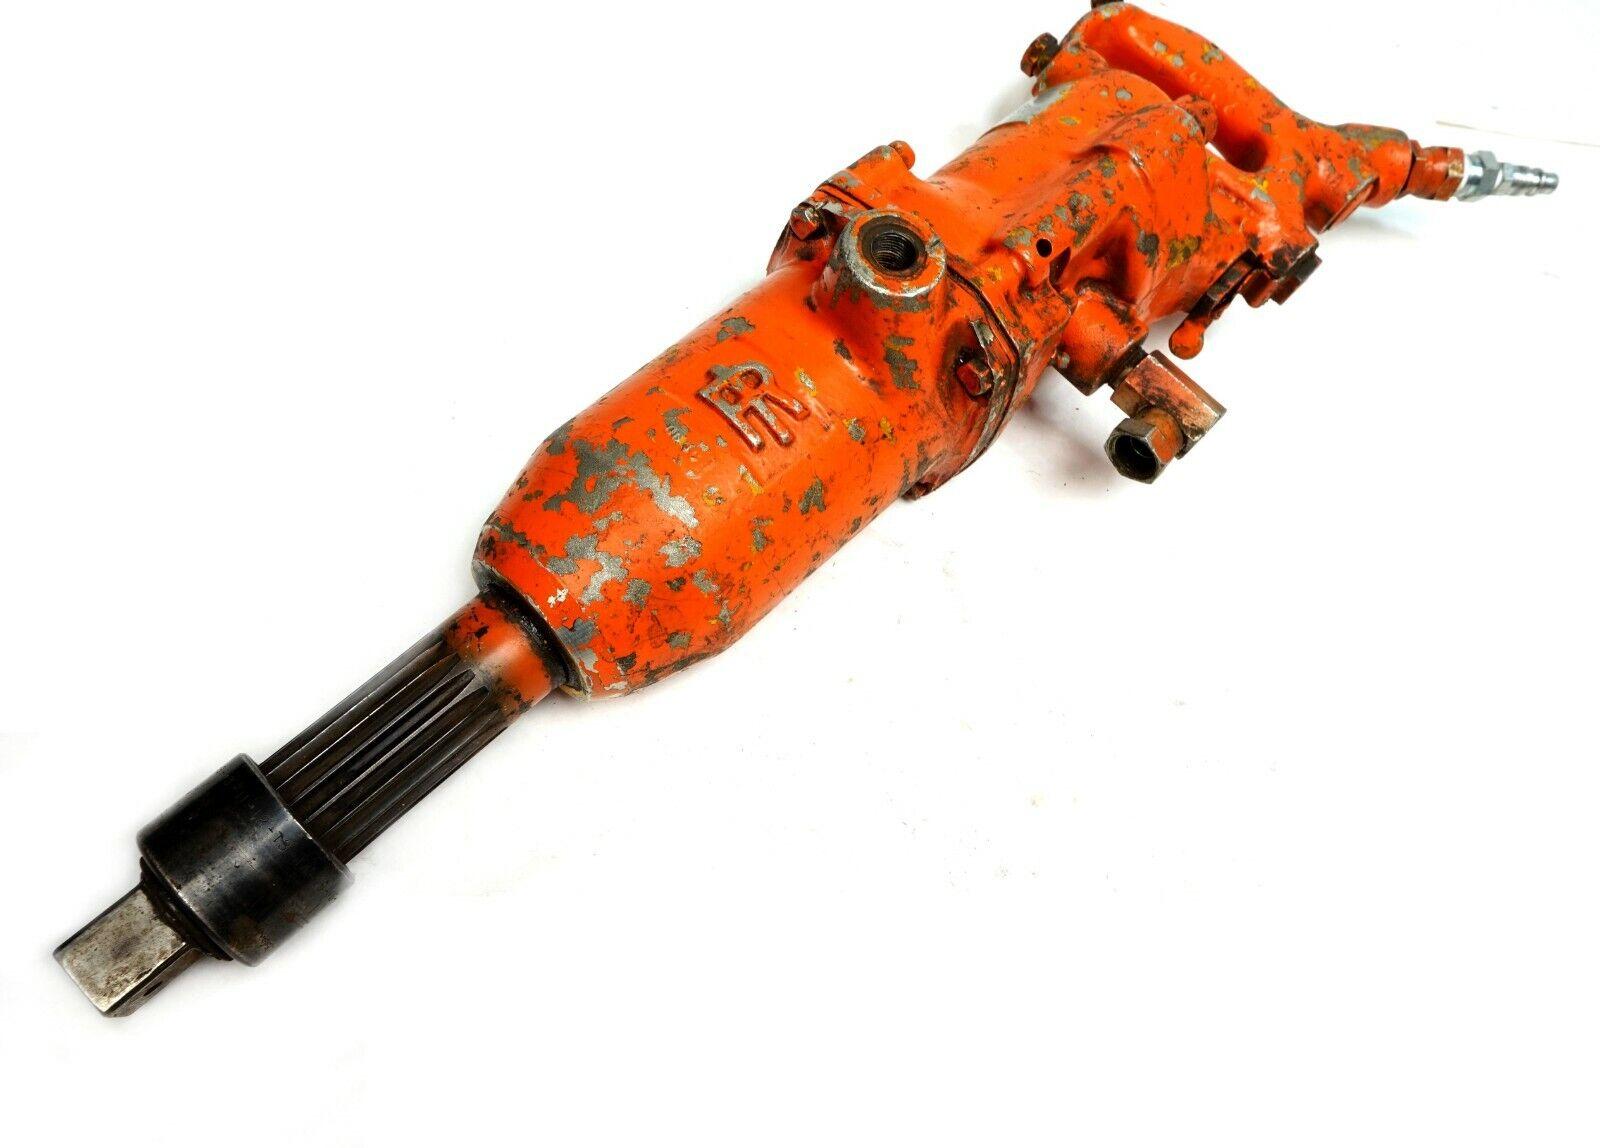 Ingersoll Rand Impact Drill